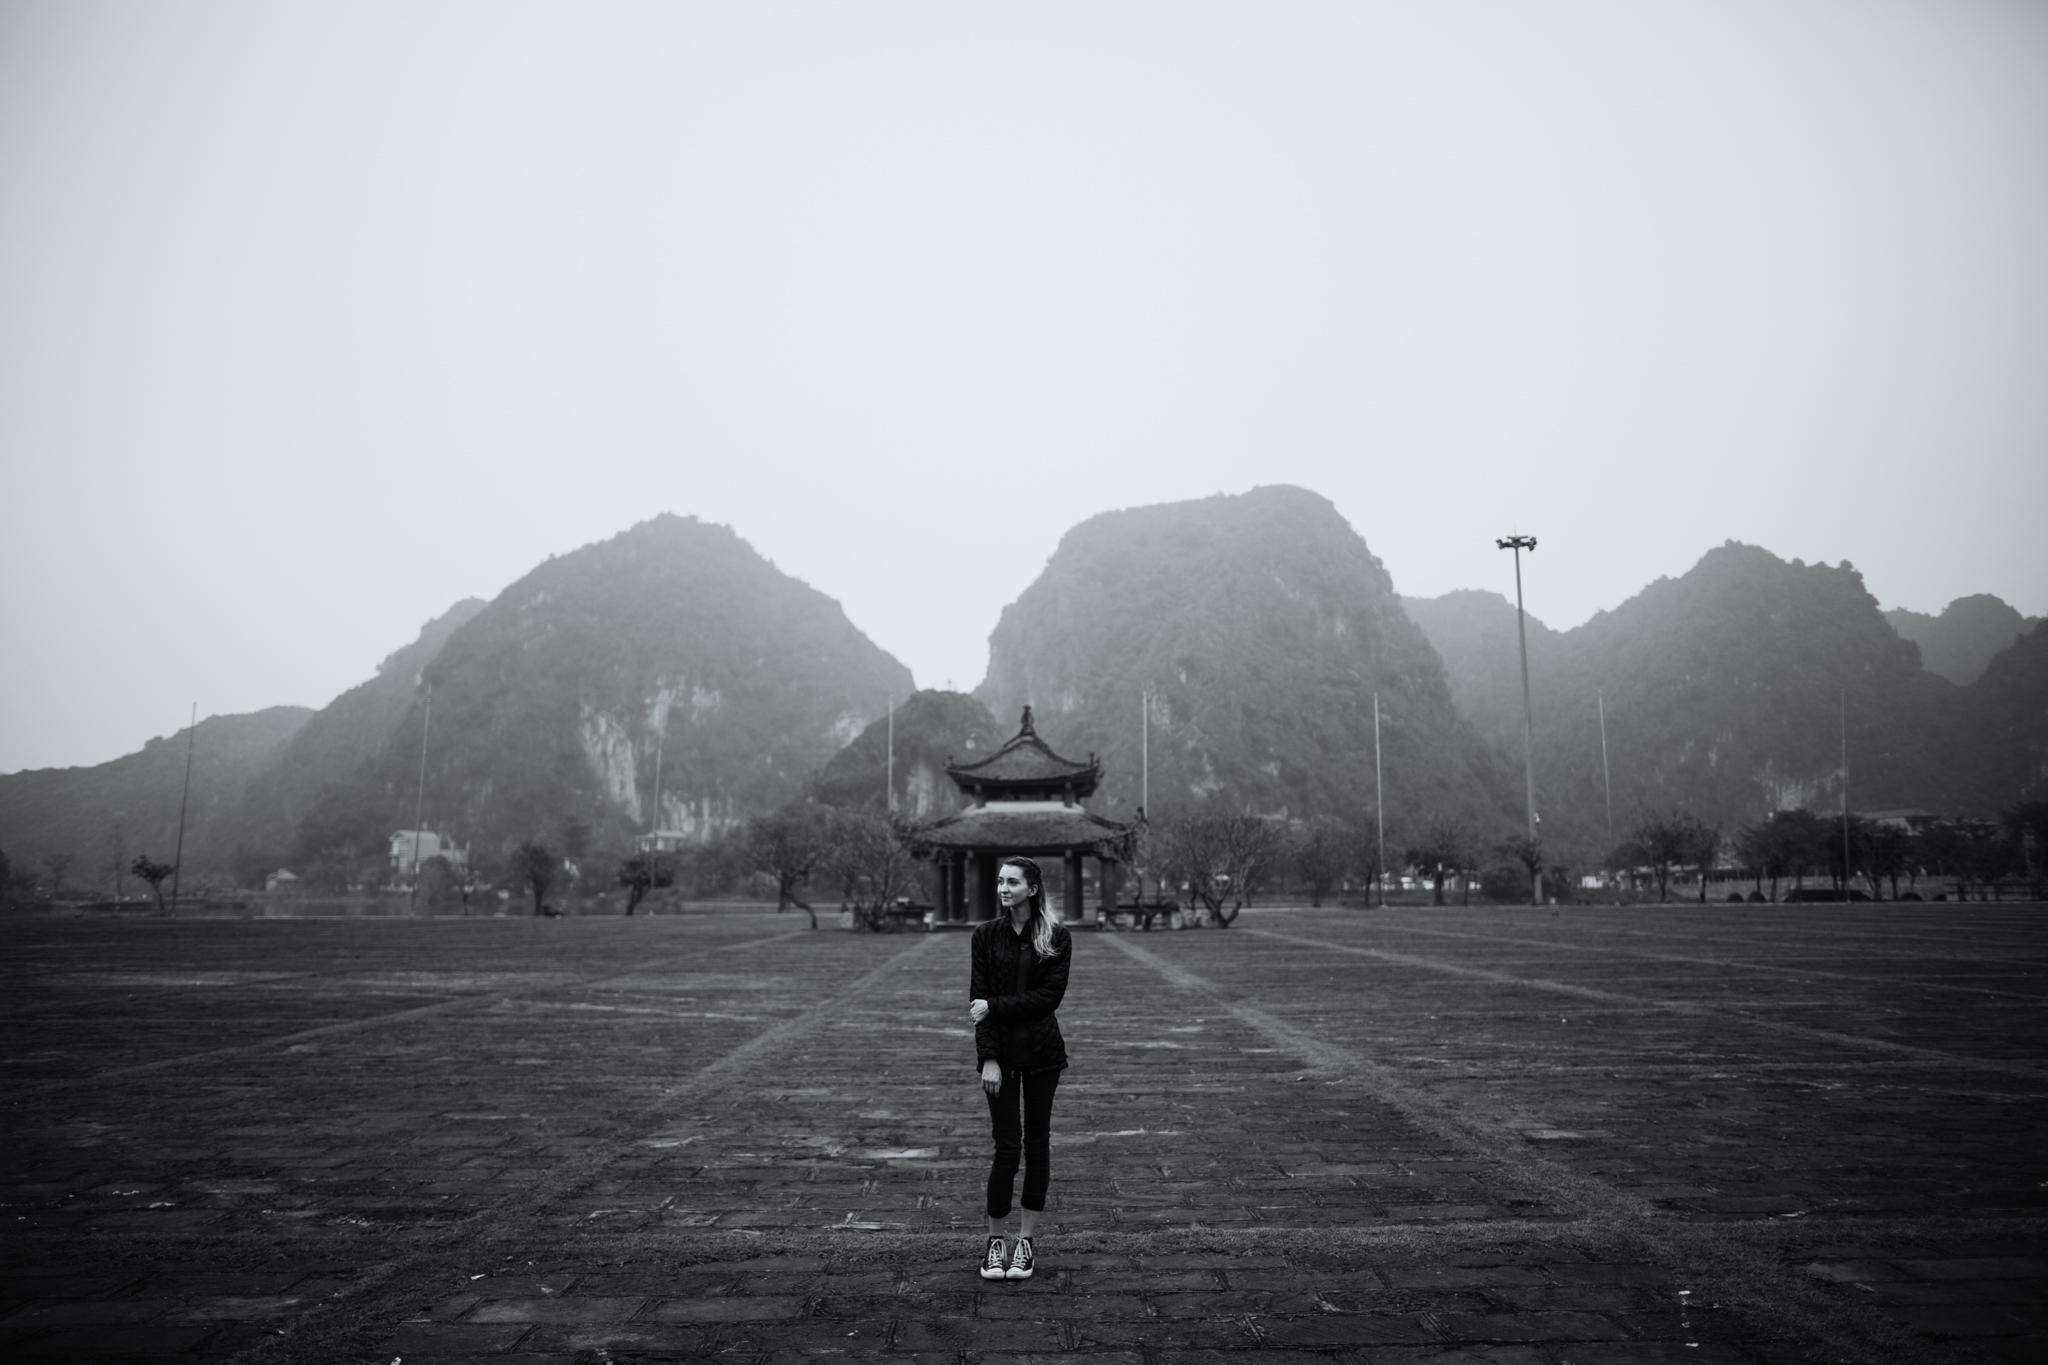 Hoa Lu temples of the Dinh & Le Dynasties - Ninh Binh Vietnam   Destination Elopement Photographer   Vow of the Wild